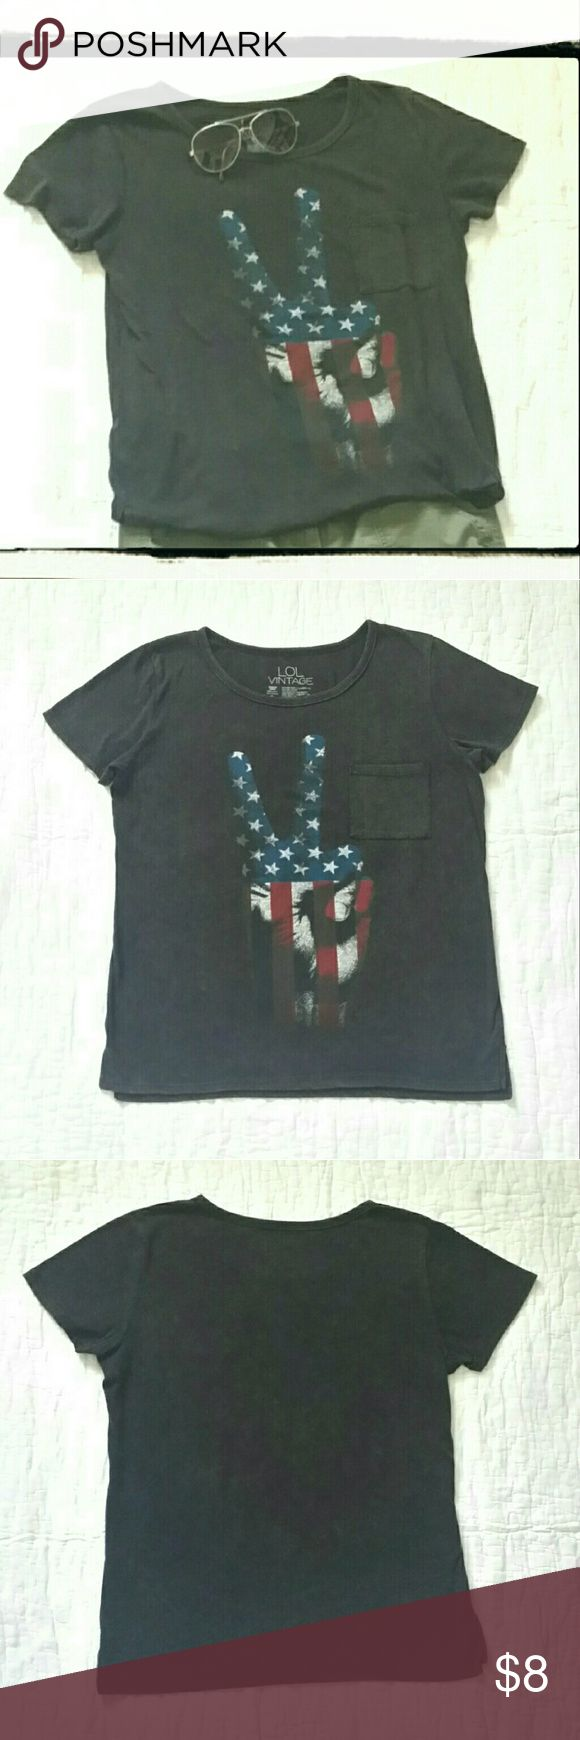 LOL Vintage Patriotic tshirt LOL Vintage tshirt, Patriotic flag print on hand peace sign image, vintage charcoal/black color, size medium. LOL Vintage  Tops Tees - Short Sleeve